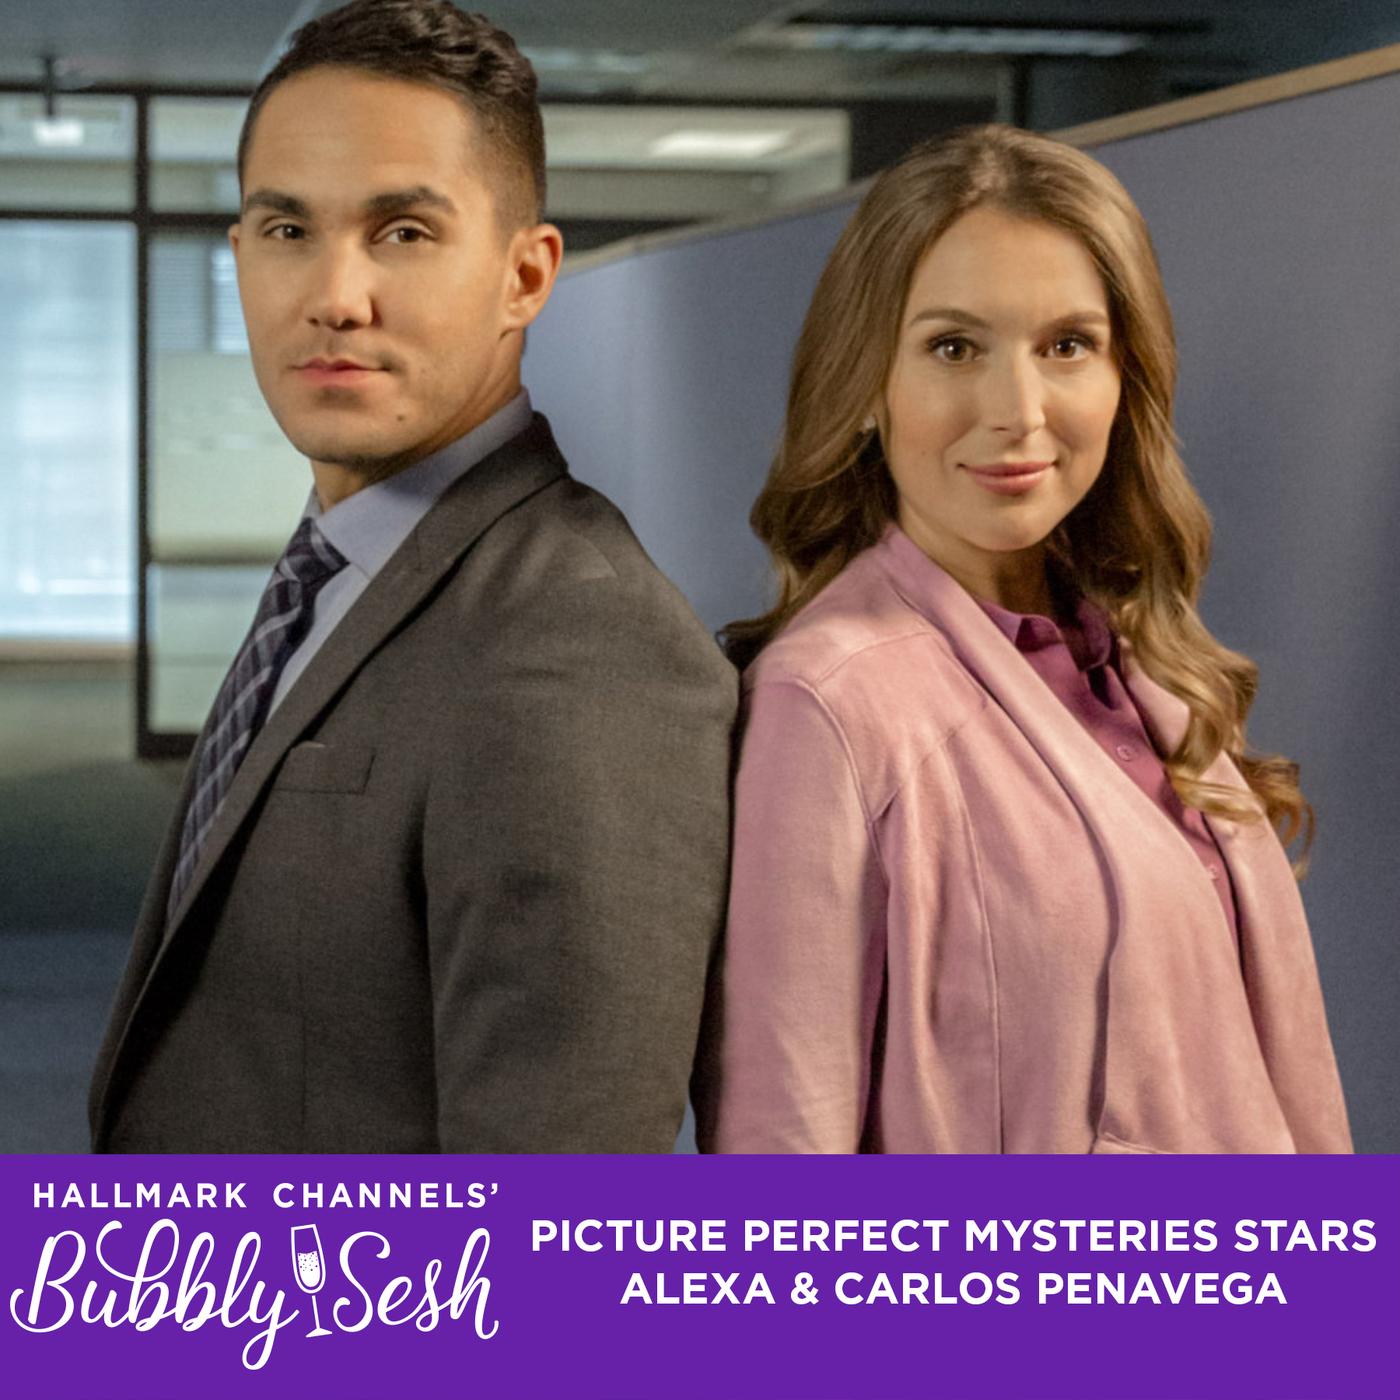 Picture Perfect Mysteries stars Alexa & Carlos PenaVega Interview